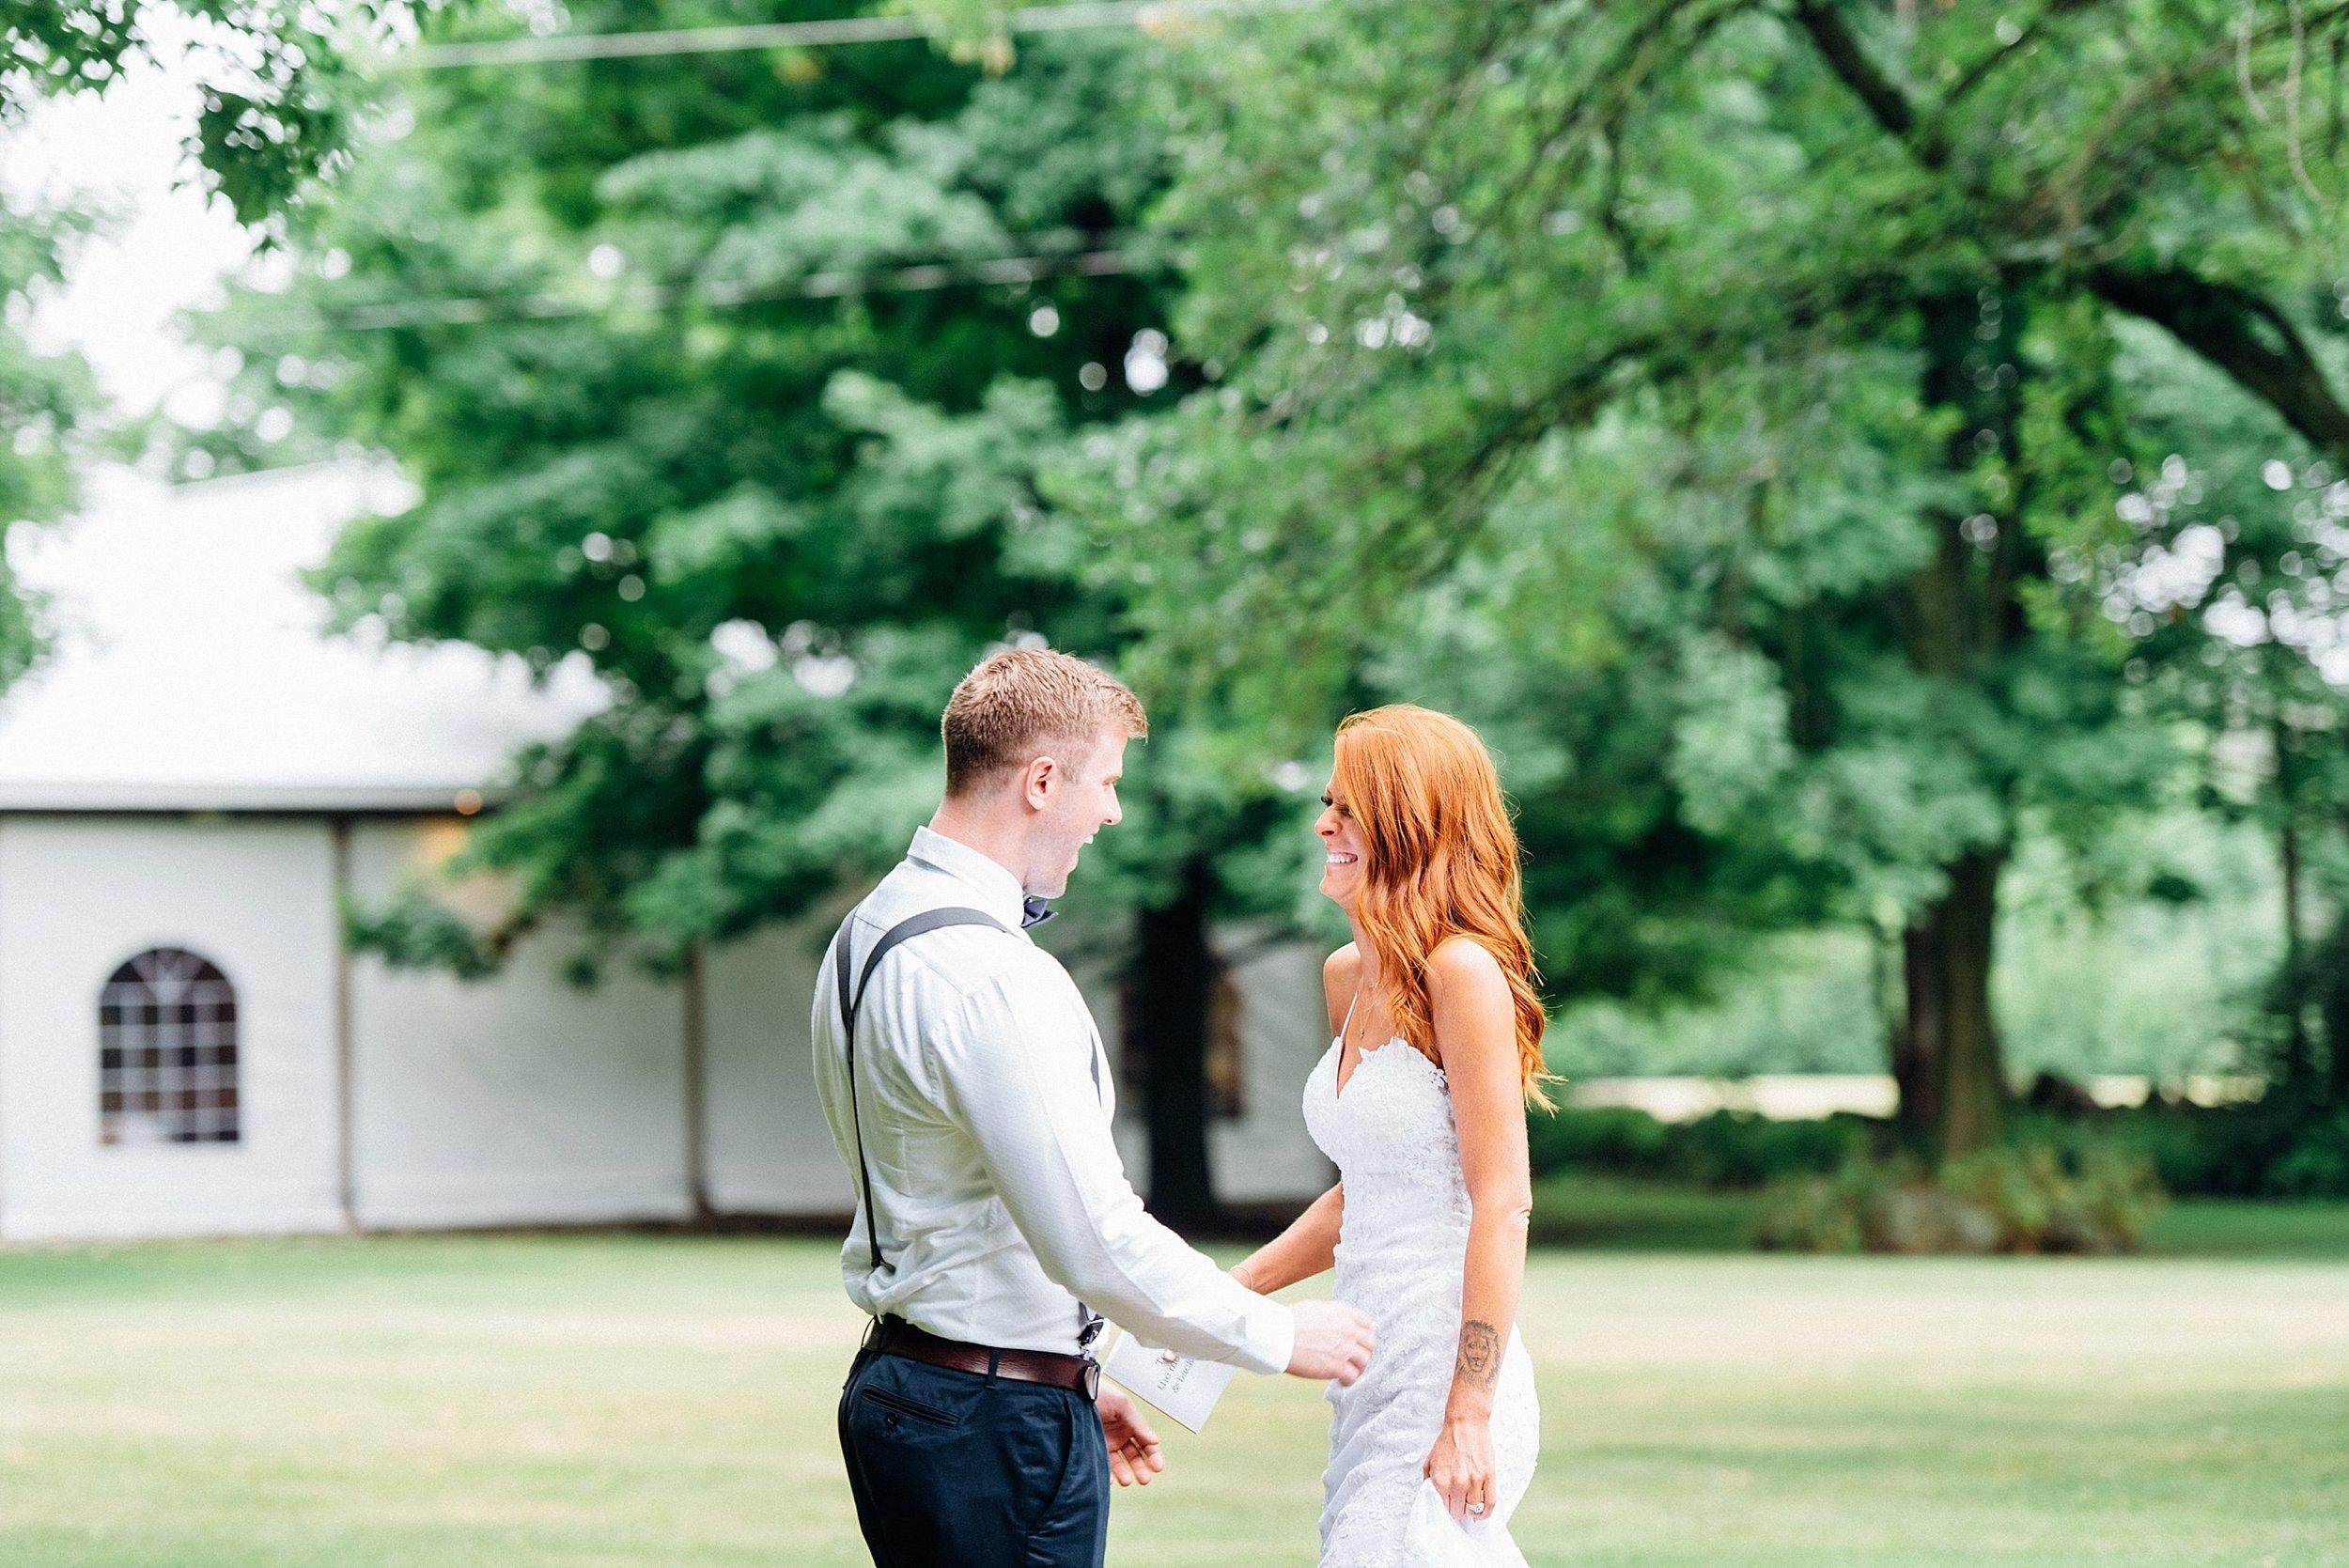 Ottawa Wedding Photographer - Stanley's Olde Maple Lane Barn Wedding - Ali & Batoul Photography_0010.jpg